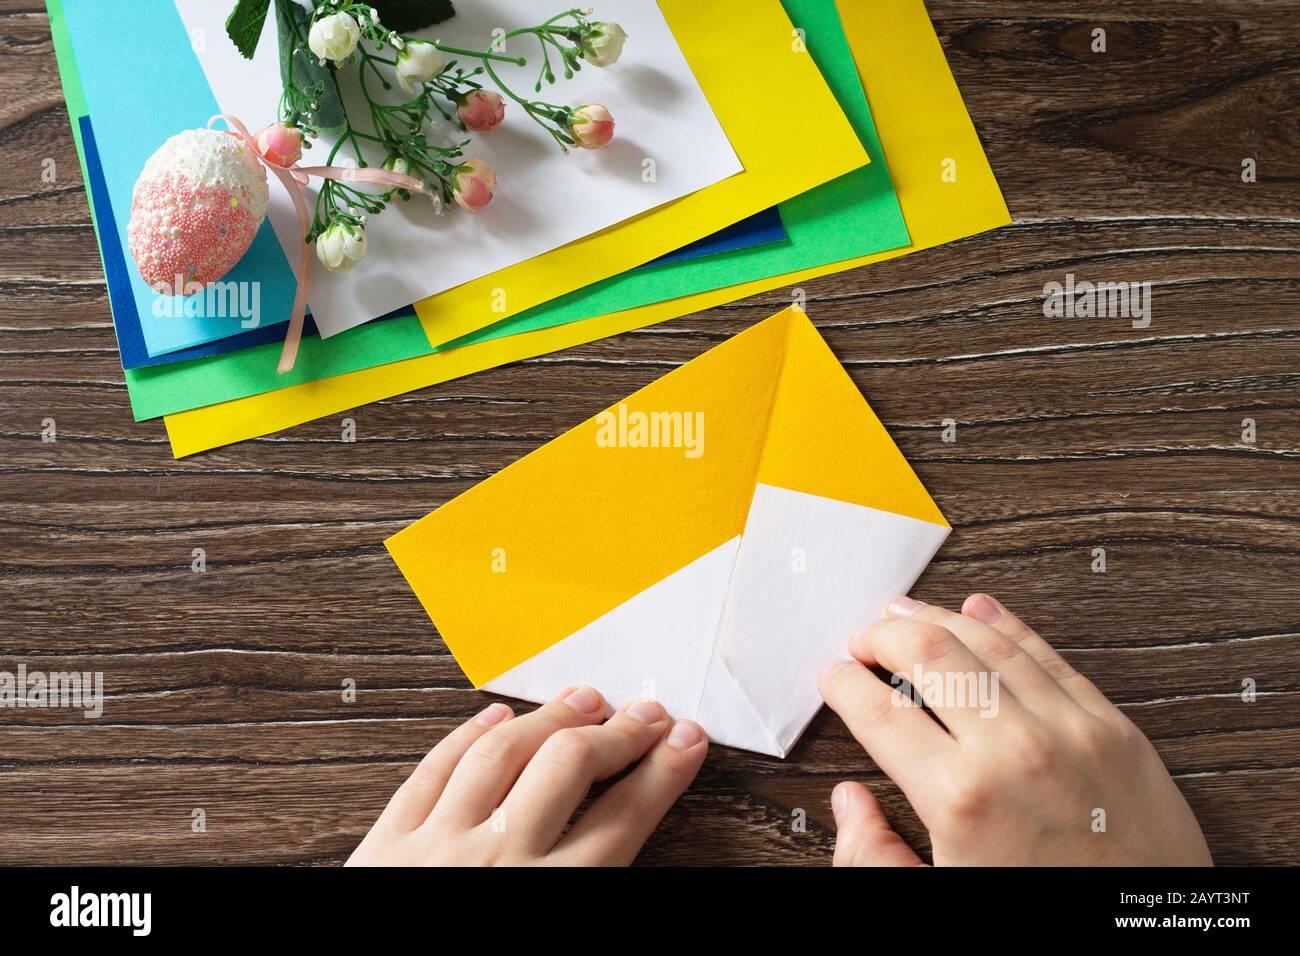 Origami Star Units Folding Instructions | Origami Instruction | 956x1300